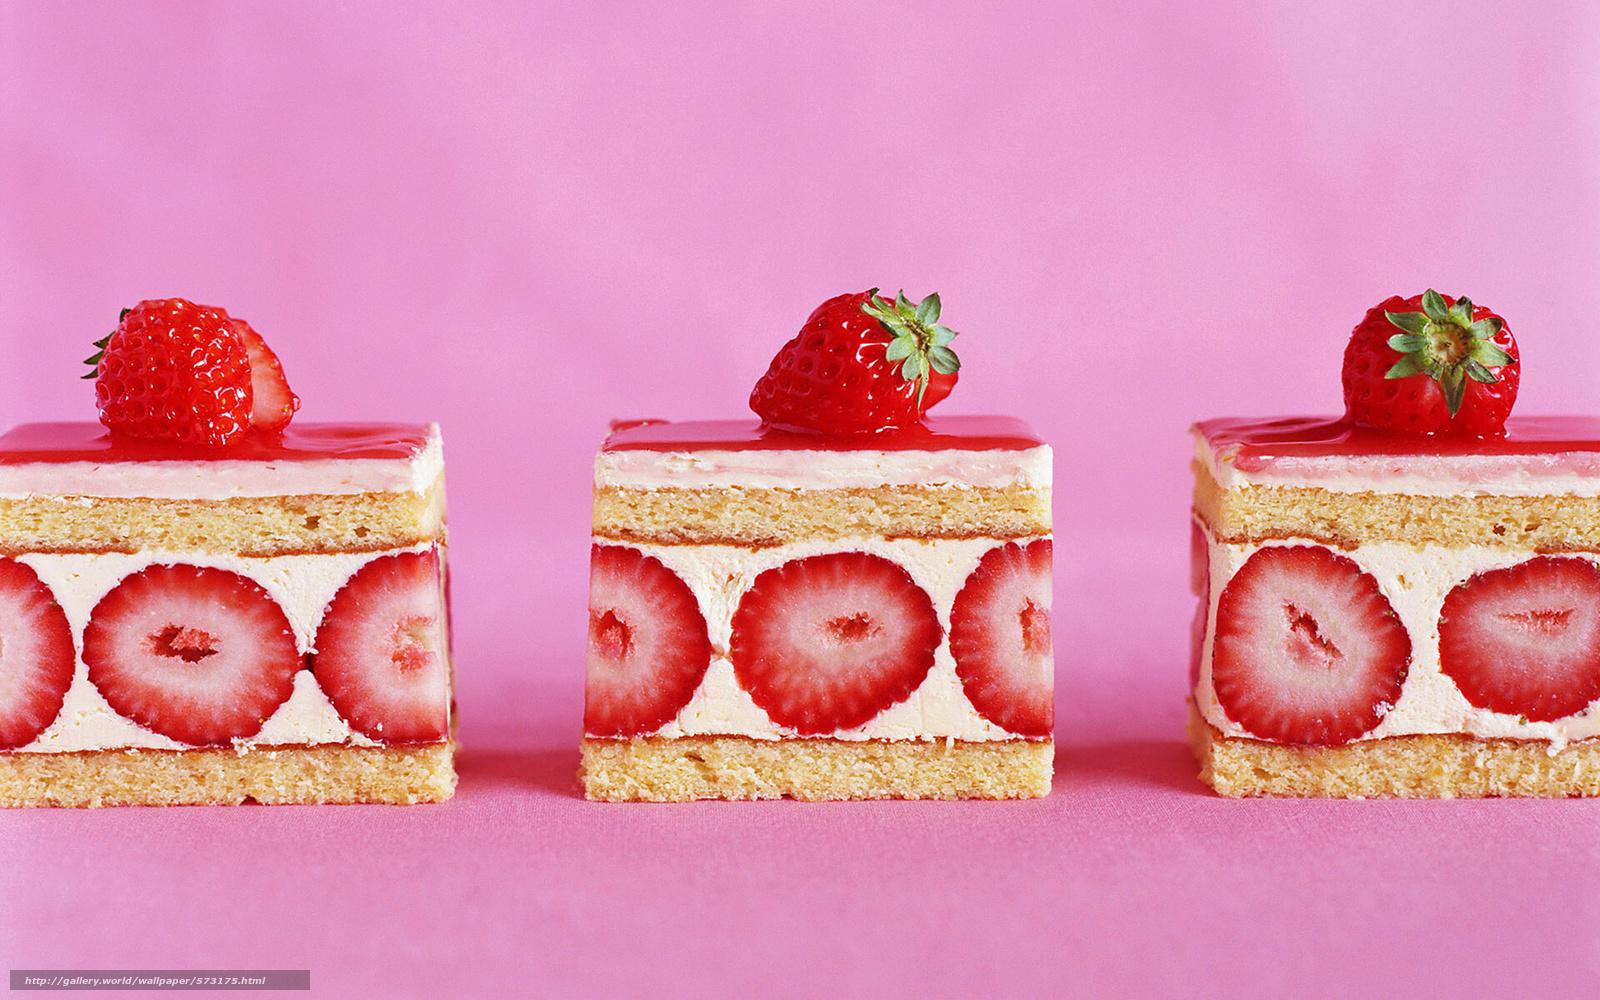 Download wallpaper mood,  miscellanea,  food,  strawberry free desktop wallpaper in the resolution 1920x1200 — picture №573175